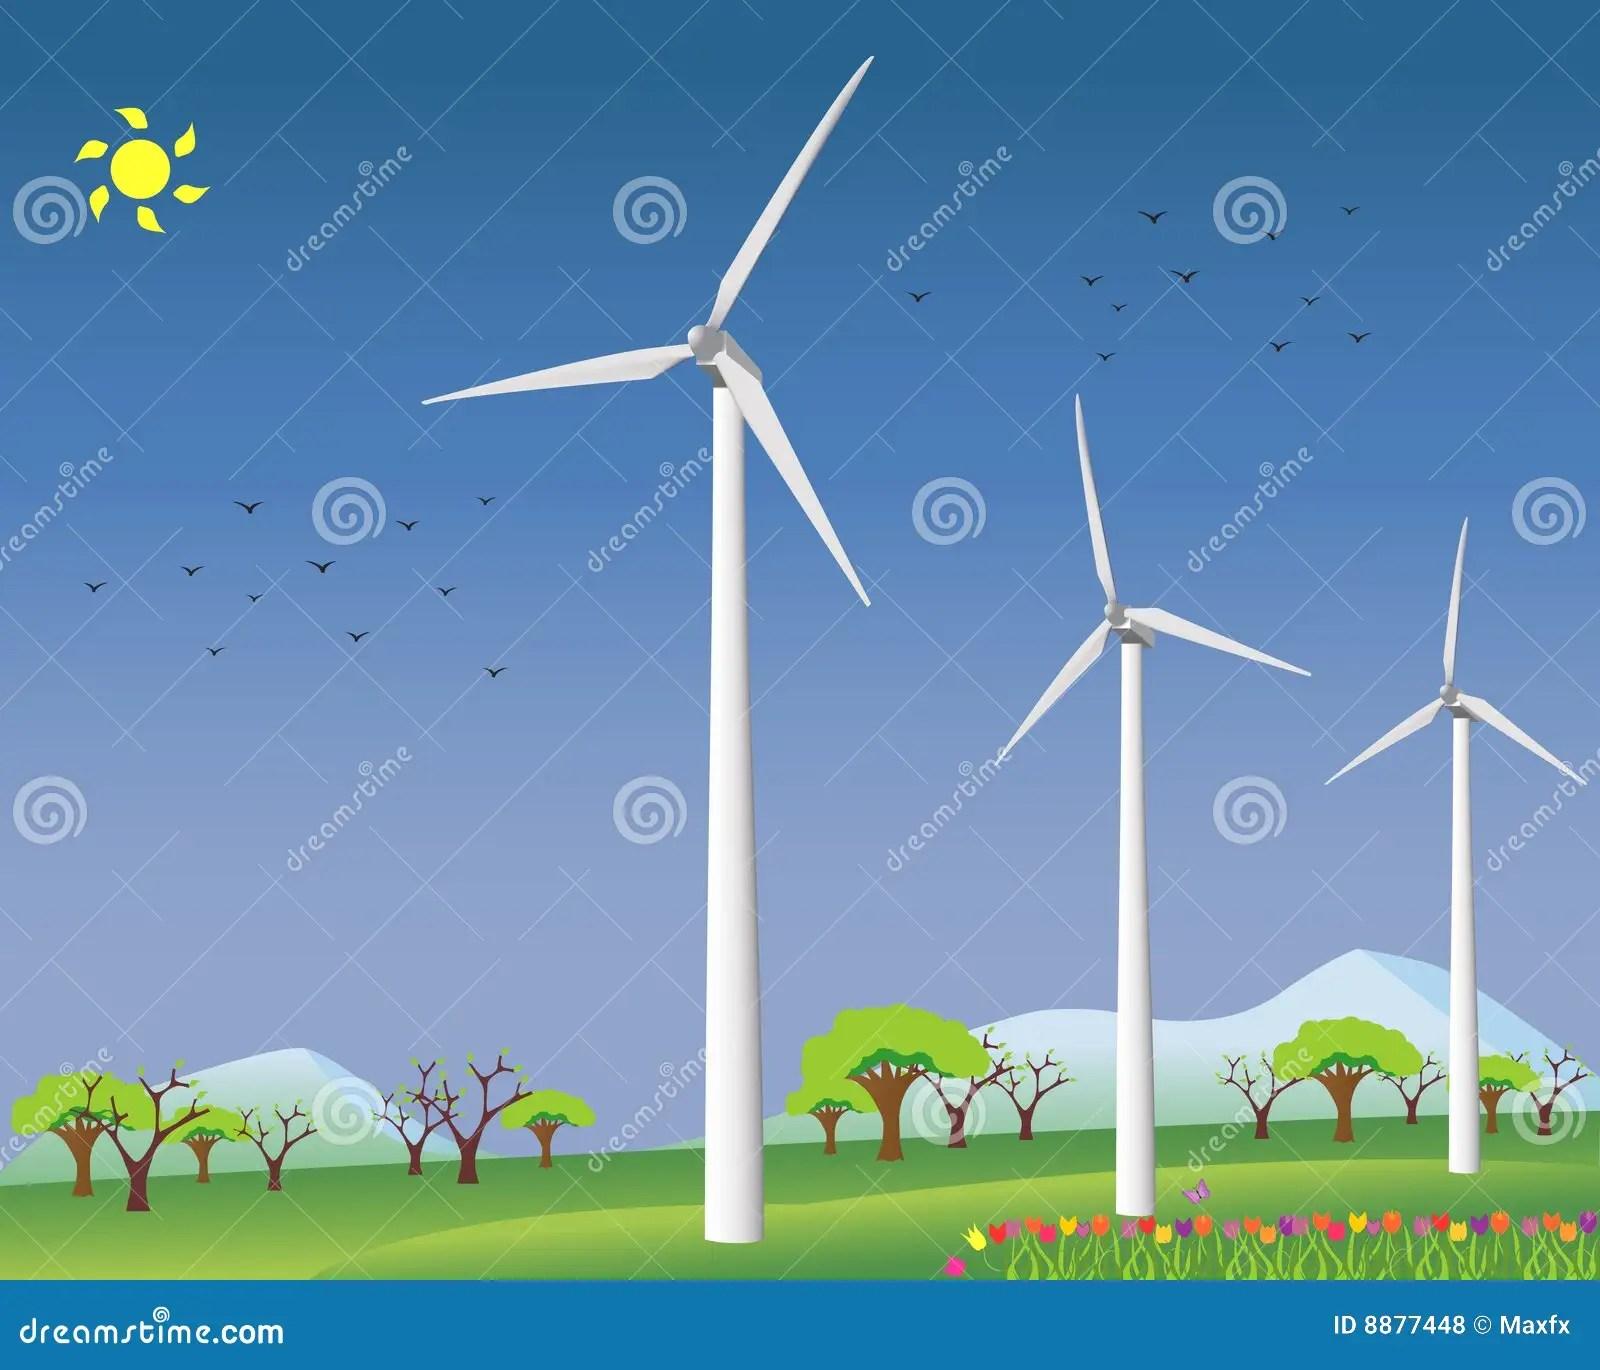 Renewable Energy Worksheet Doc